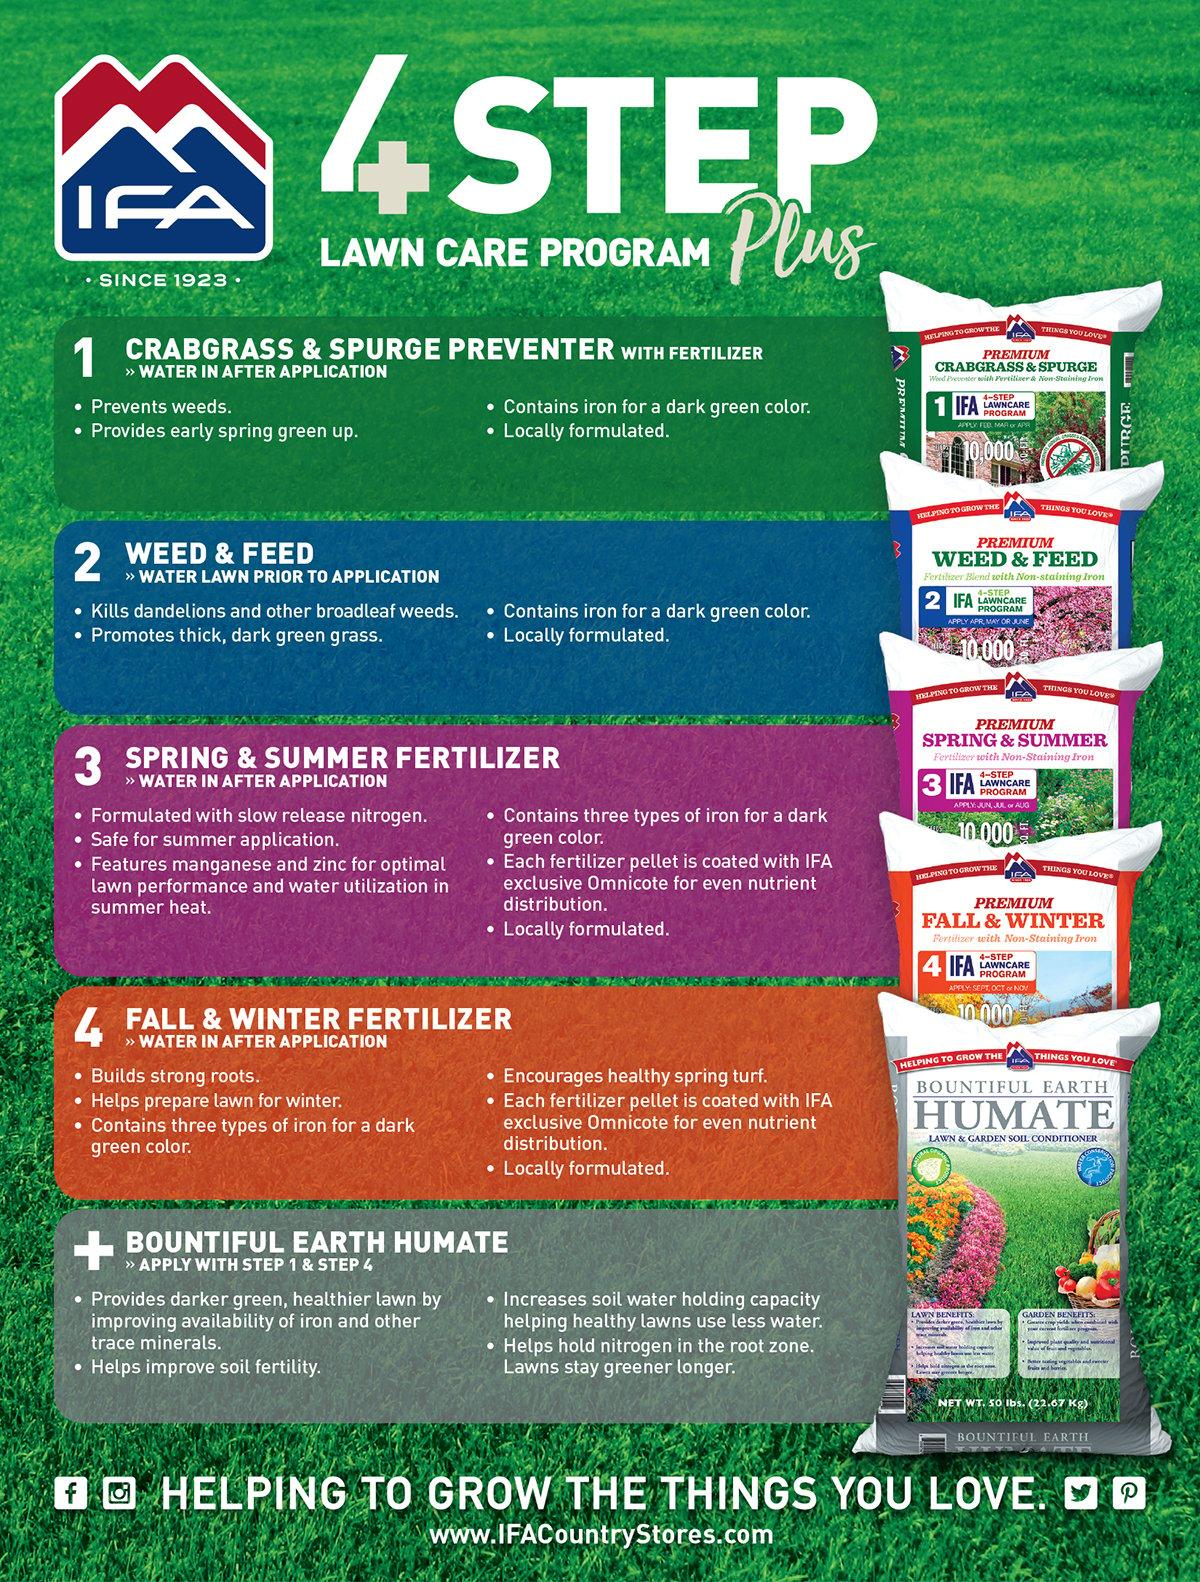 IFA 4Plus Lawn Care Program